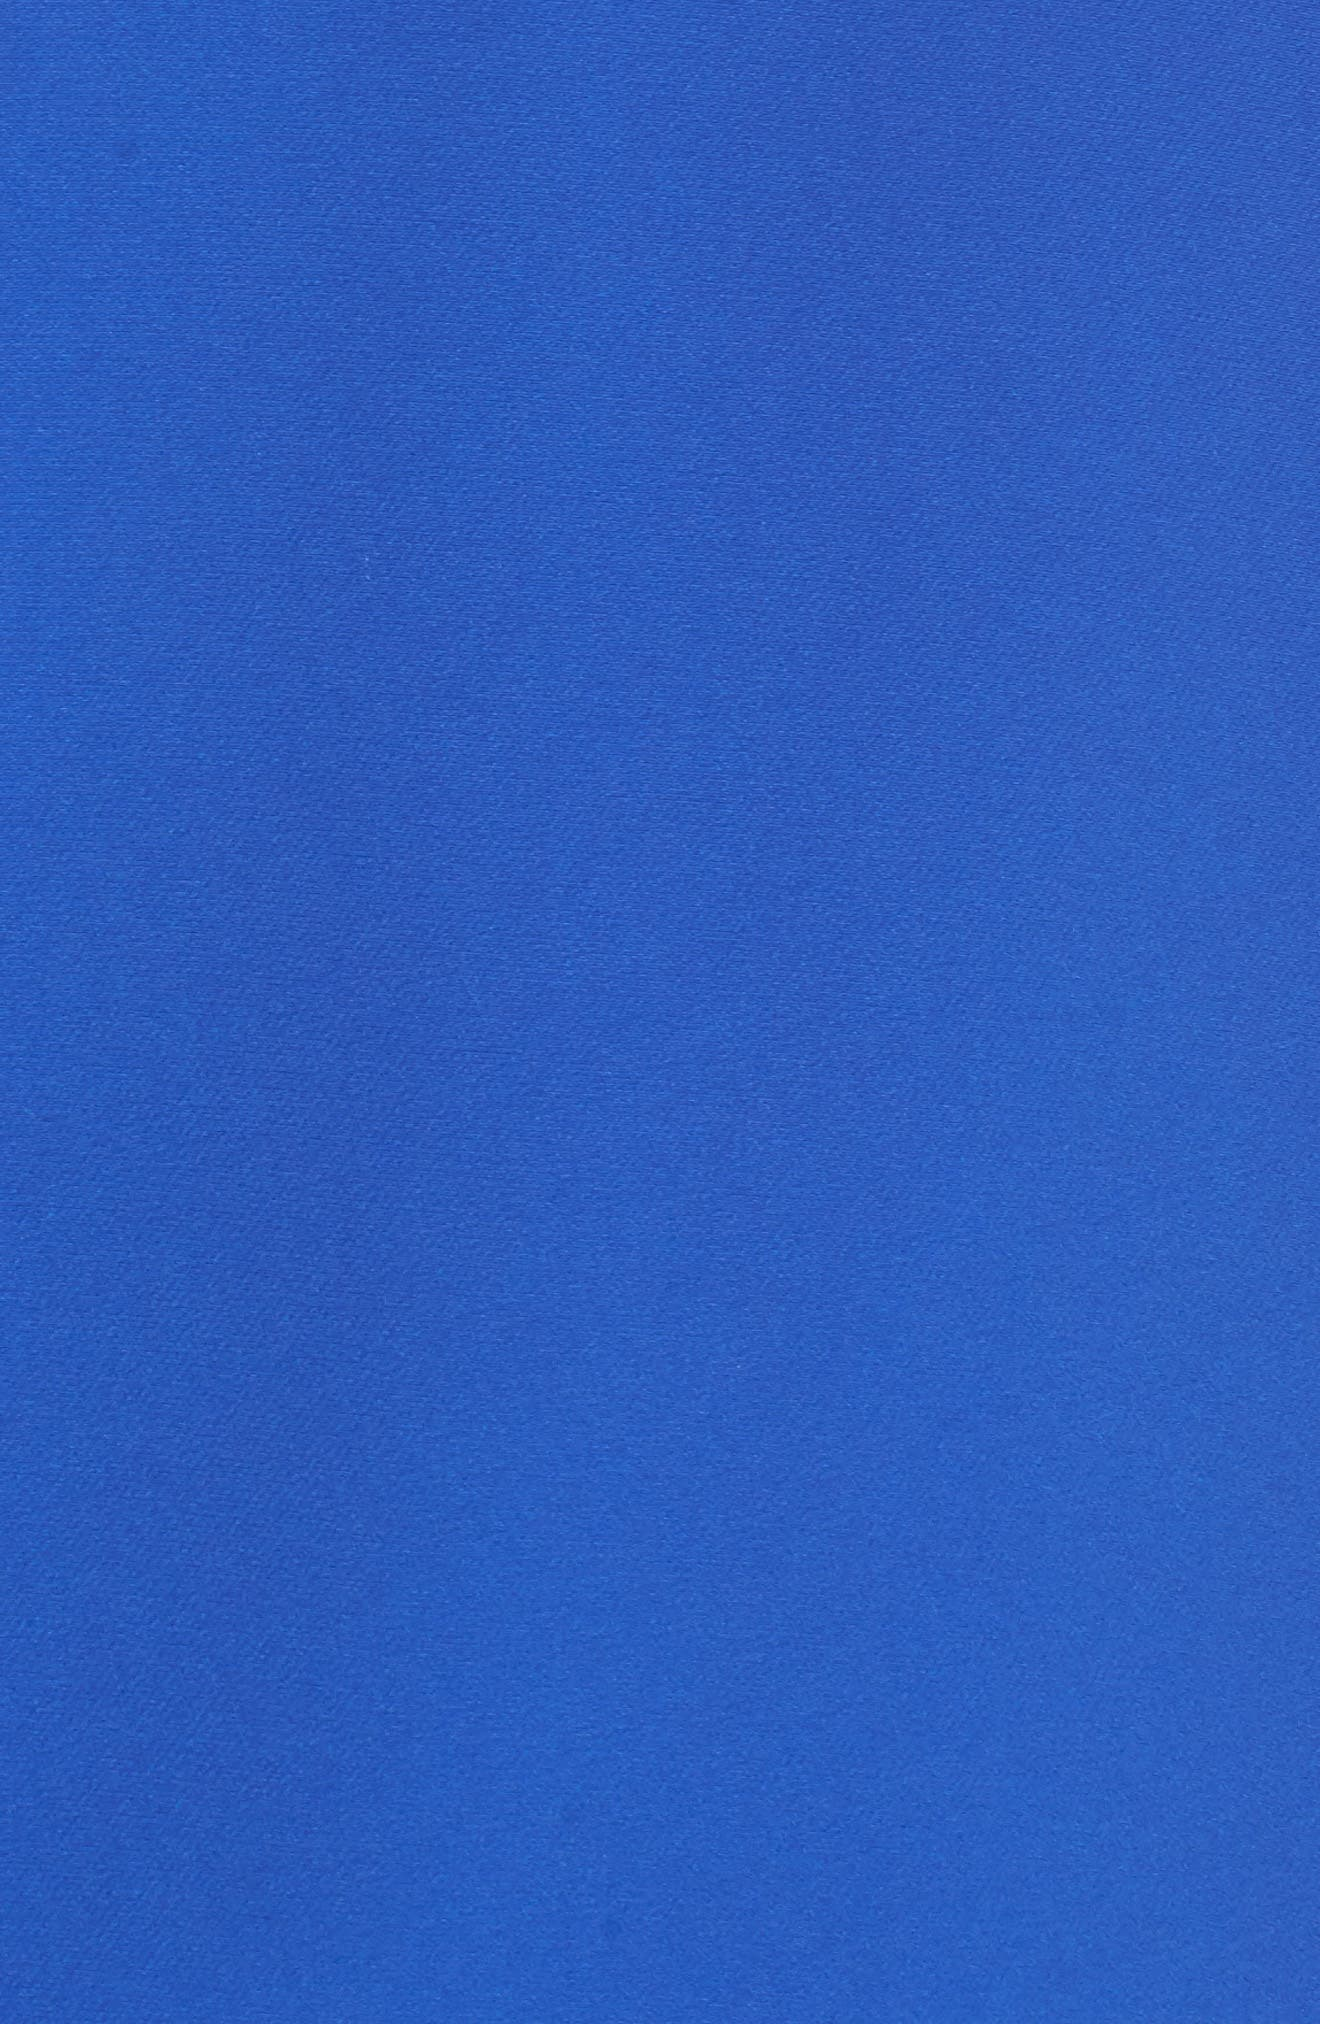 Bell Sleeve Shift Dress,                             Alternate thumbnail 6, color,                             PATRIOT BLUE